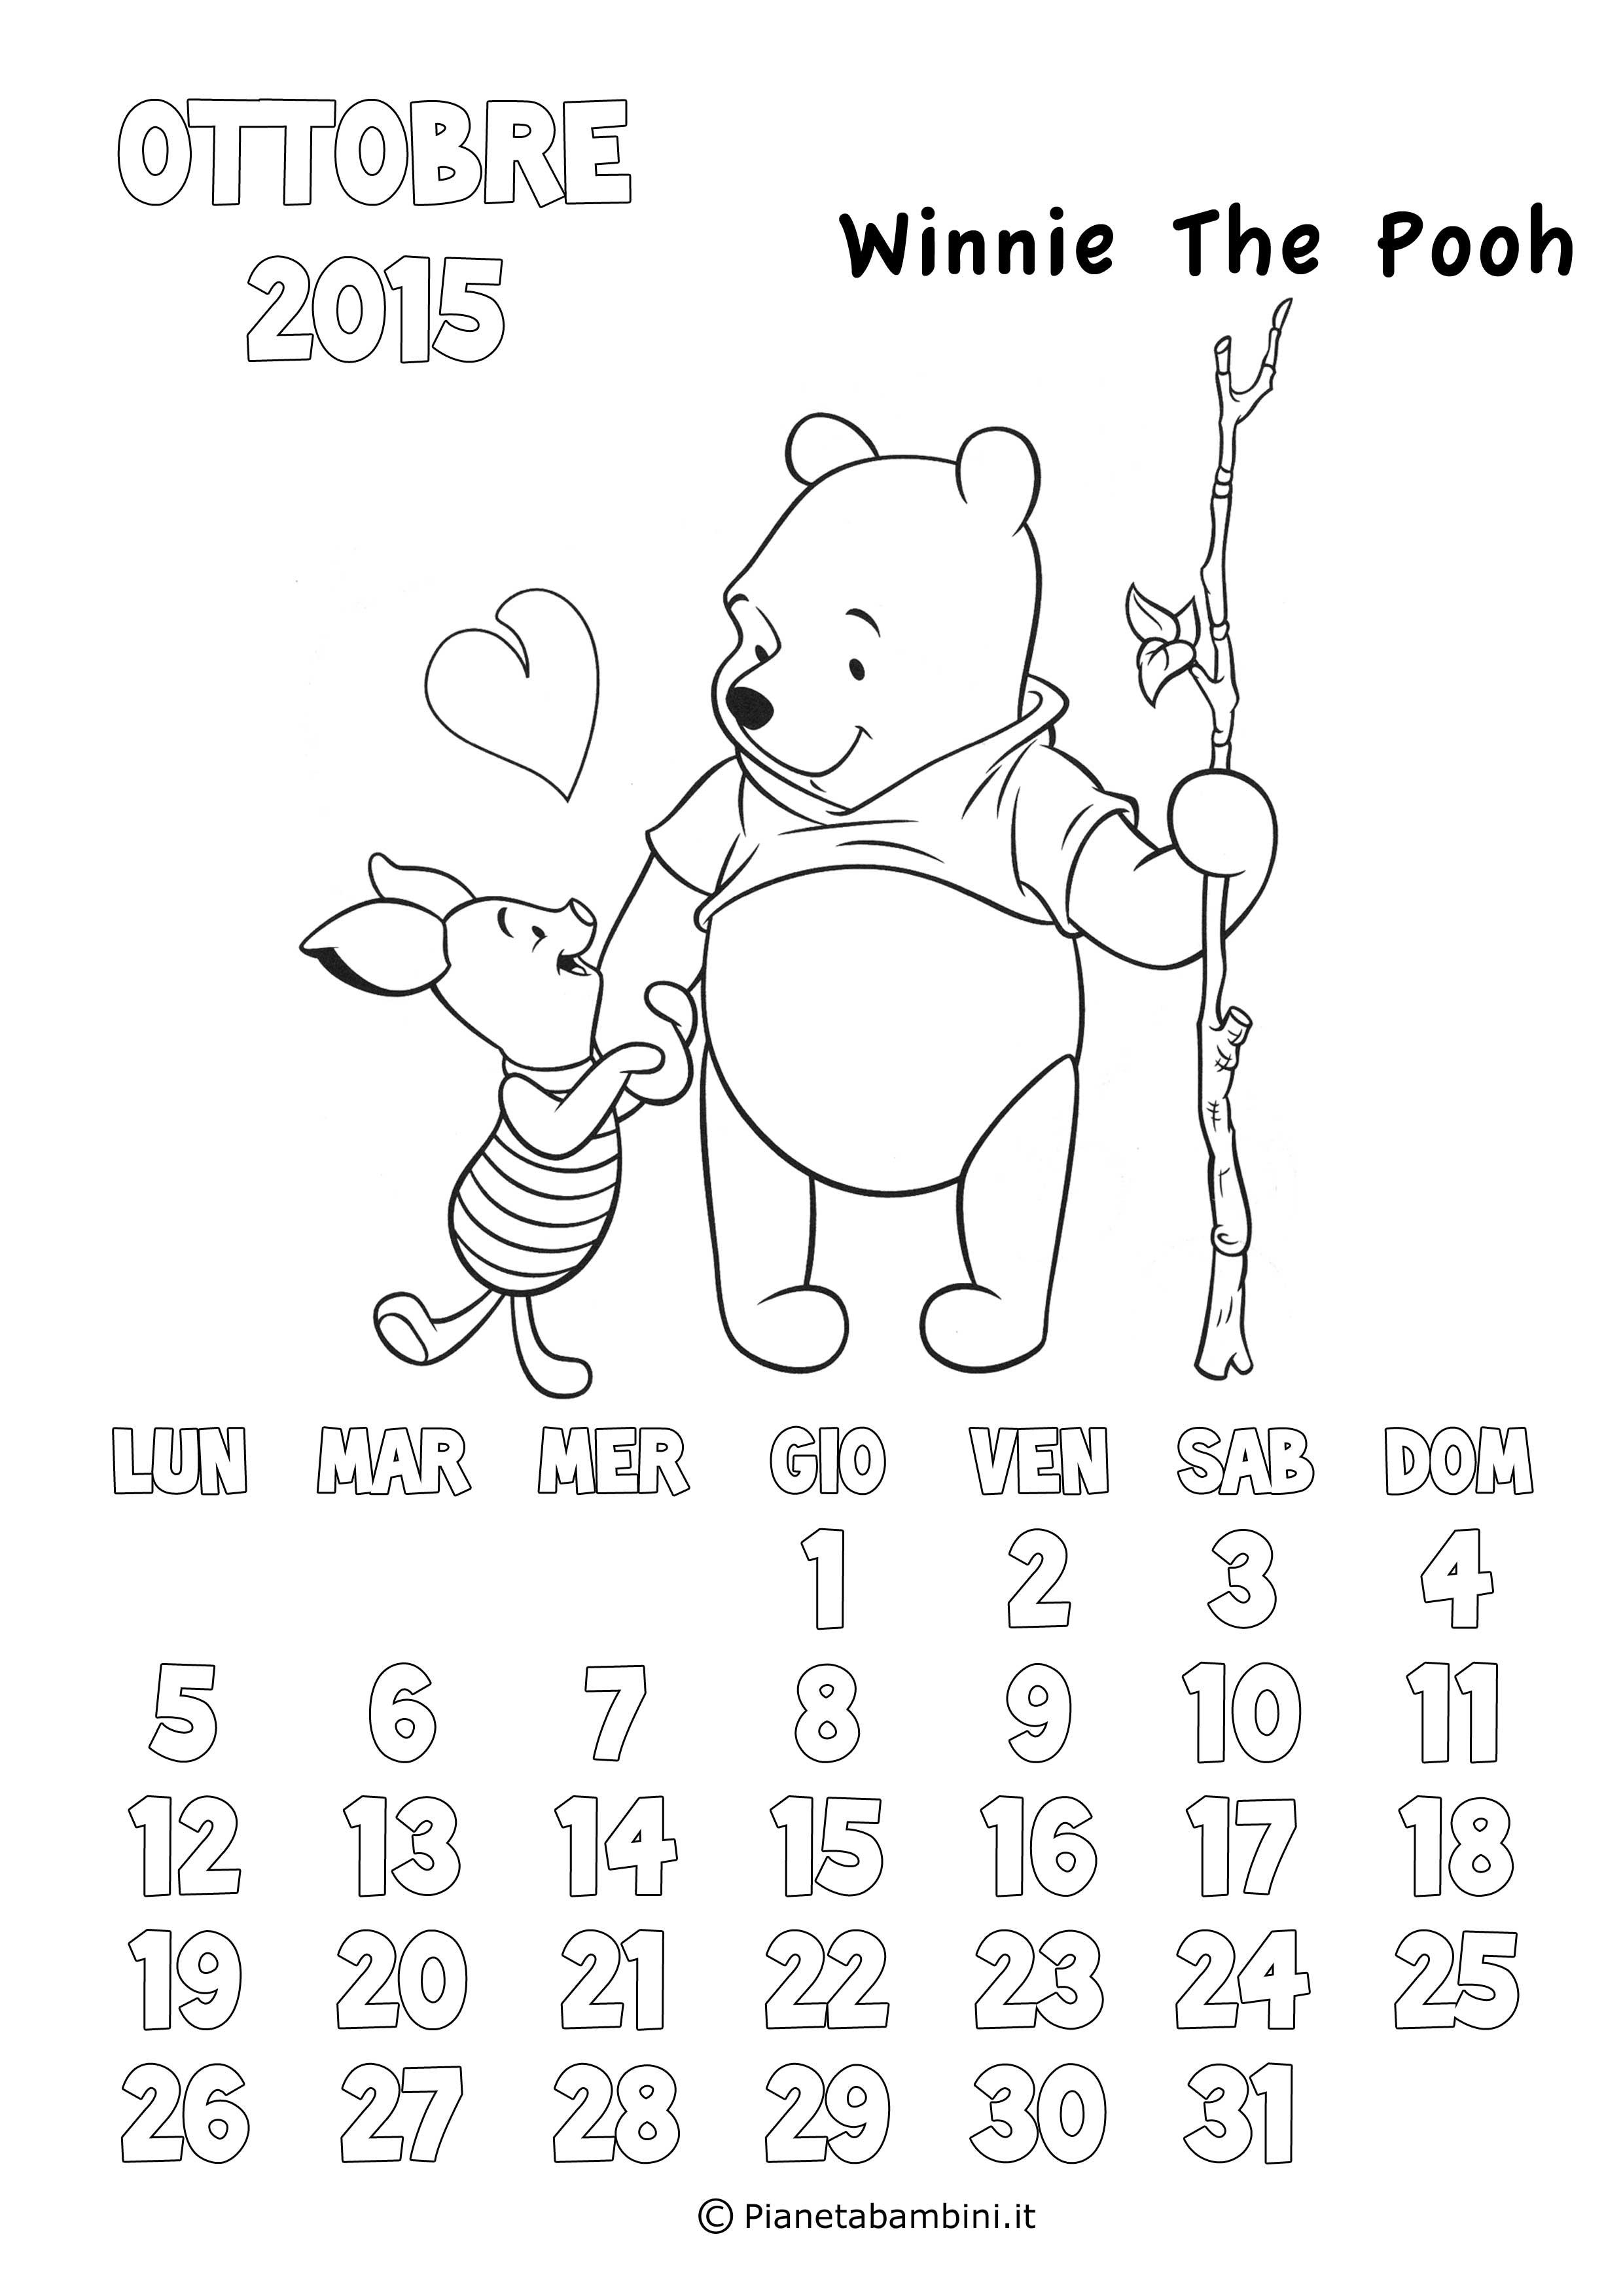 Ottobre-2015-Winnie-Pooh